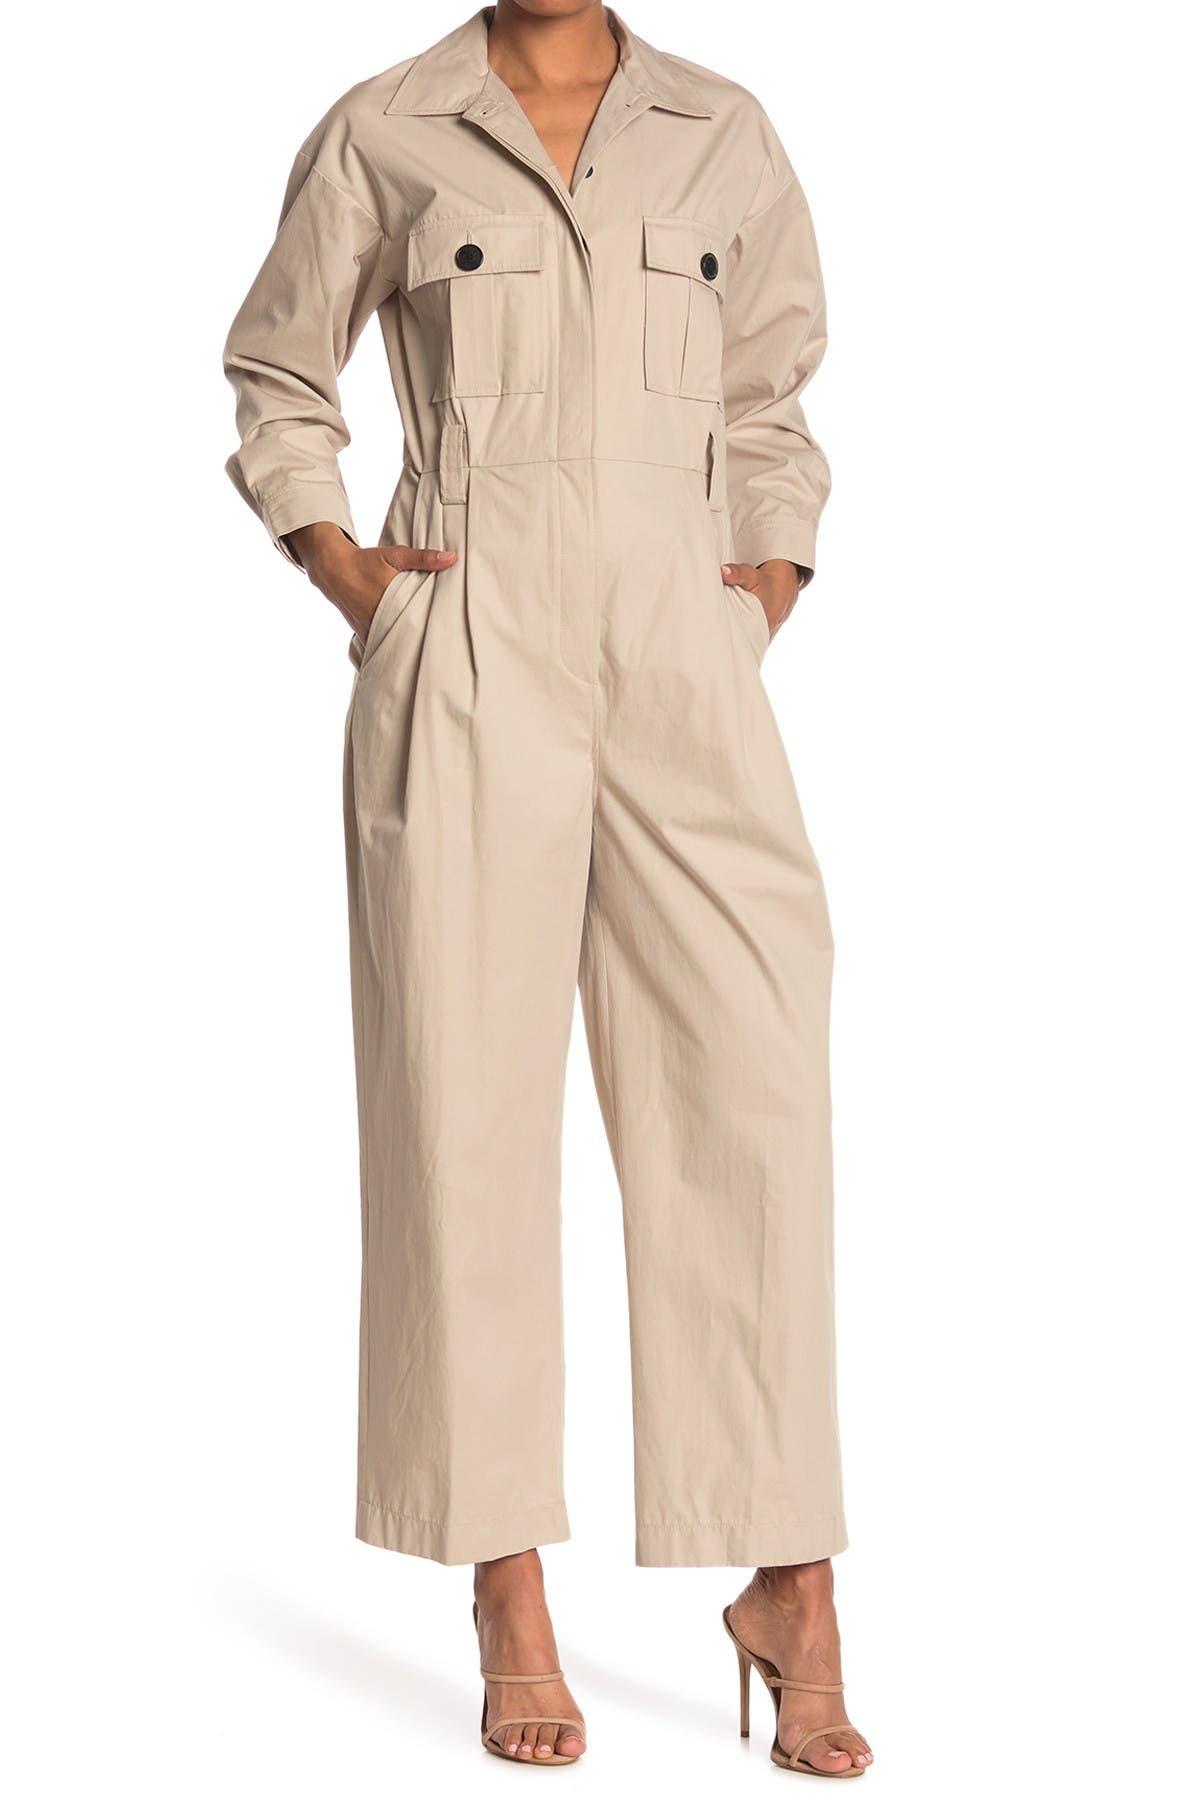 Image of ba&sh Clot Point Collar Jumpsuit